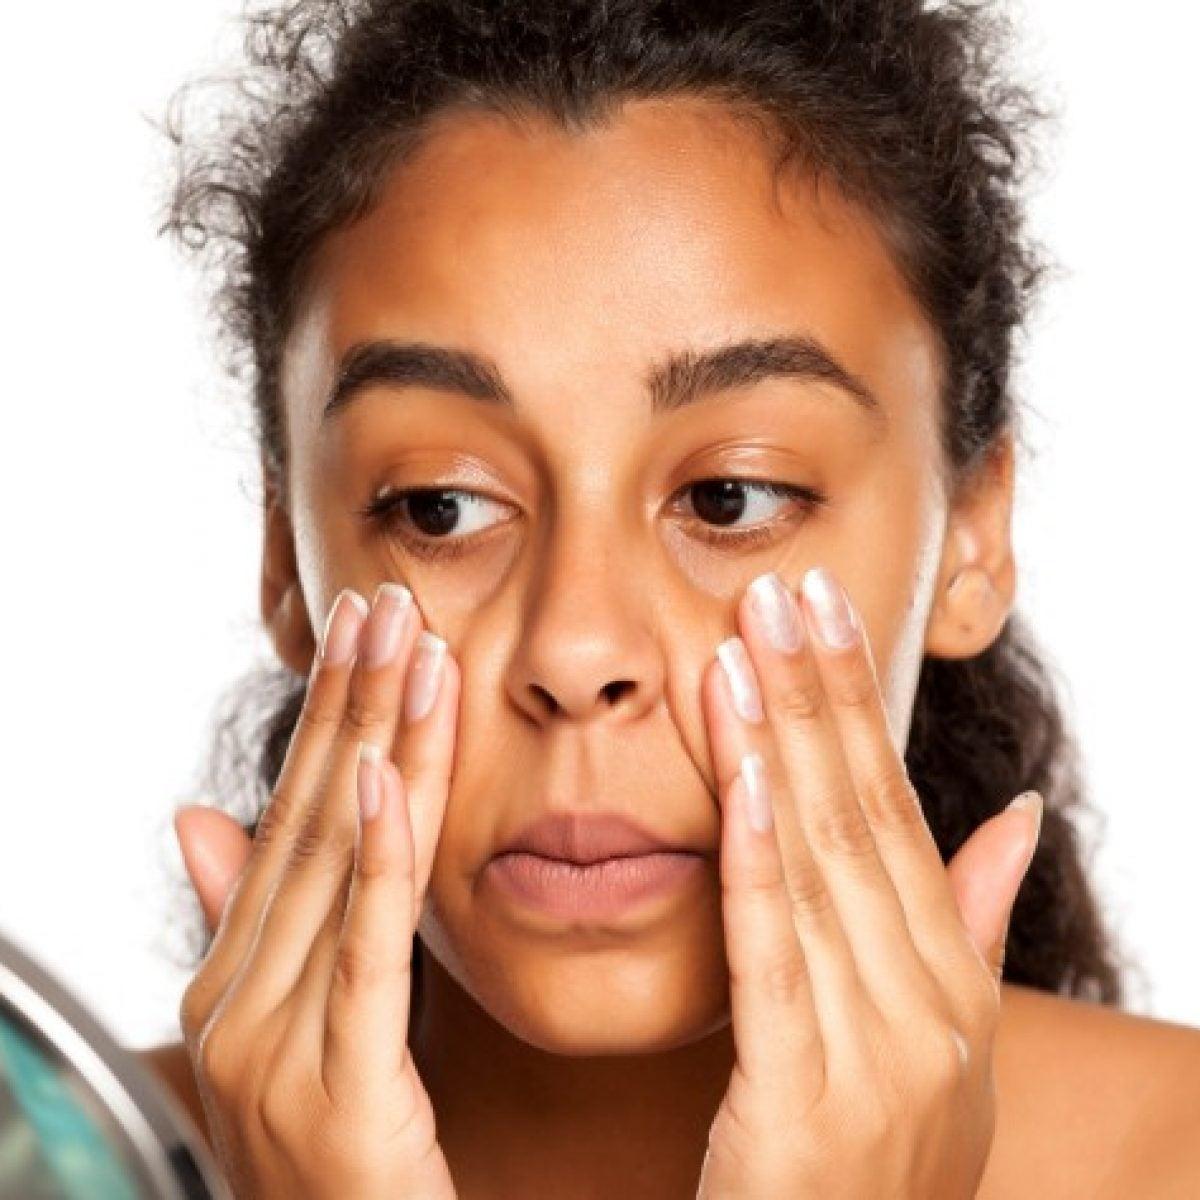 10 Post-Quarantine Beauty Resolutions I Plan To Keep